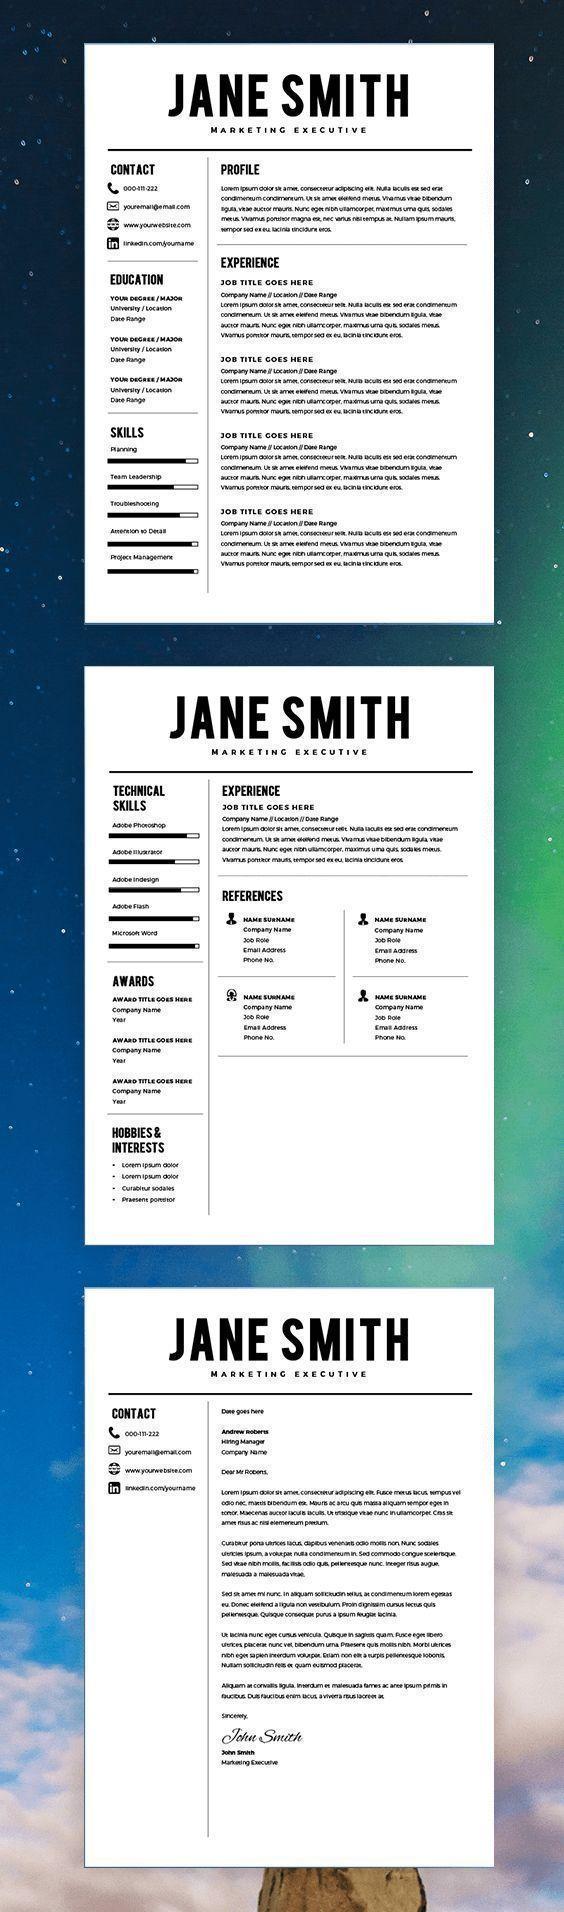 Microsoft Word Resume Template For Mac Glamorous Best Resume Template  Cv Template  Cover Letter  Ms Word On Mac .